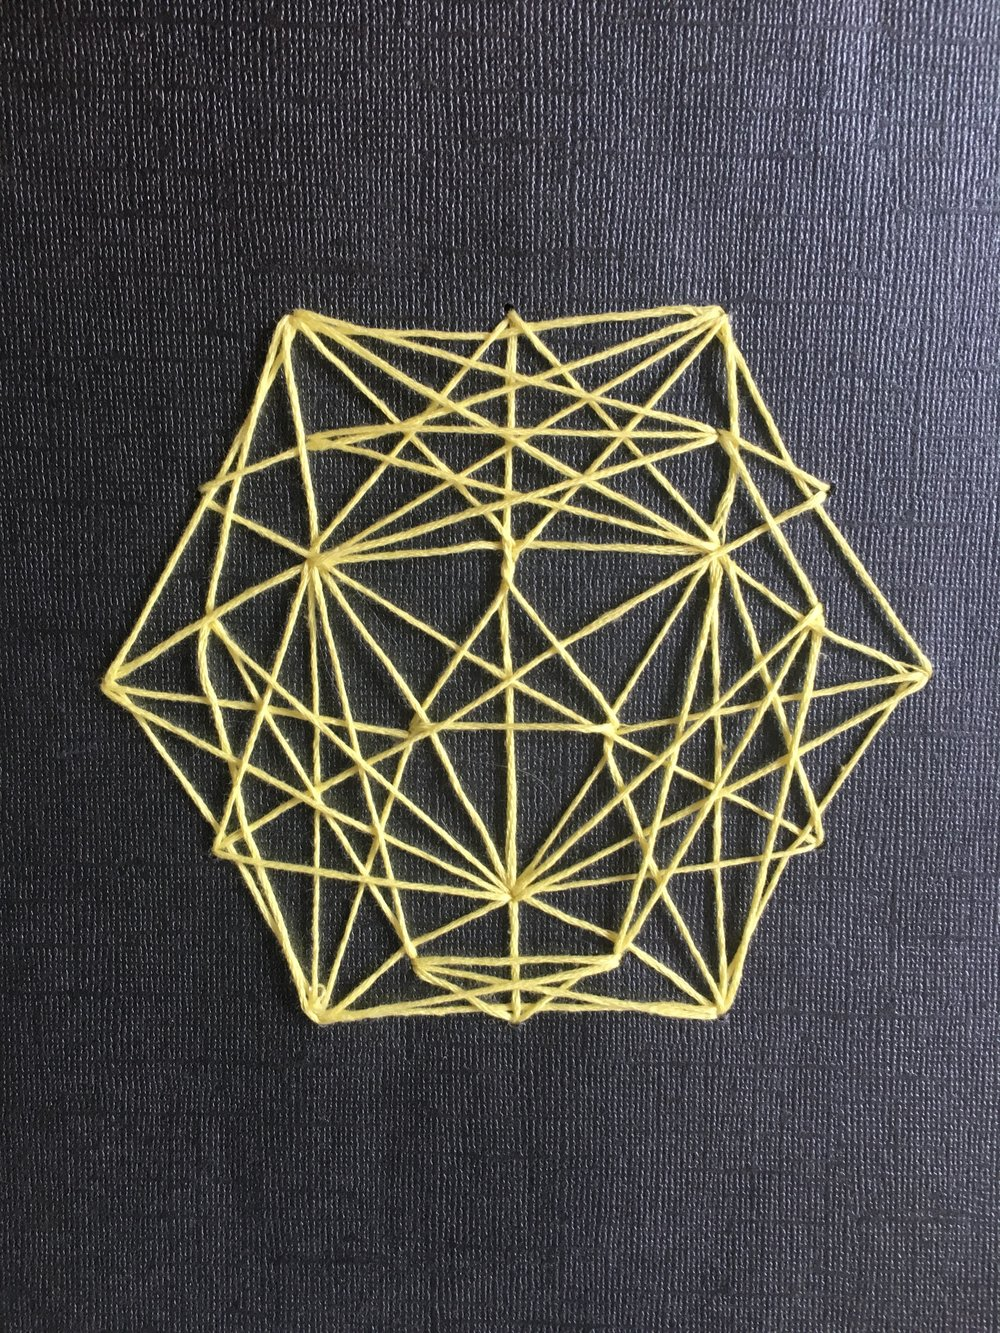 Geometric String Art Arts Crafts Ideas